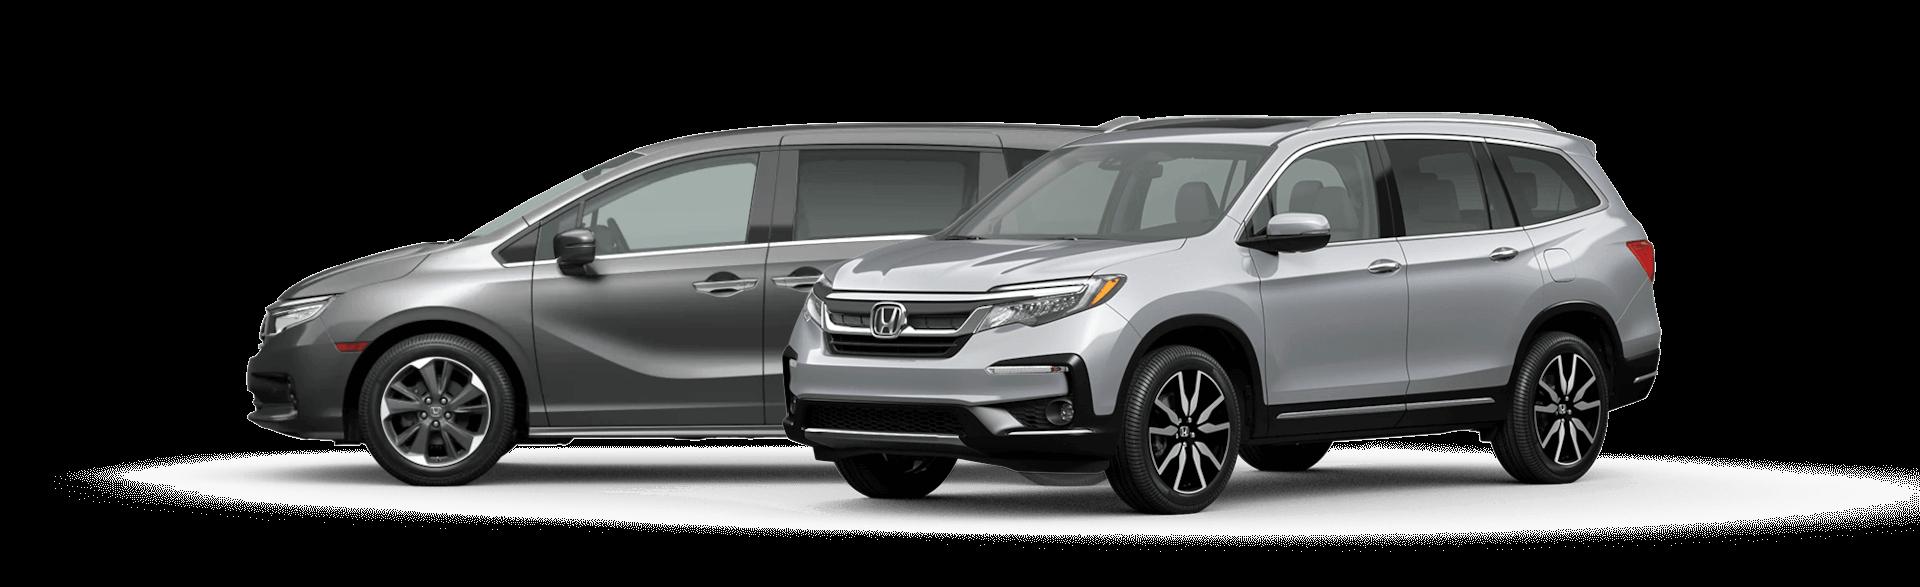 Best Family Cars: Honda Odyssey and Honda Pilot